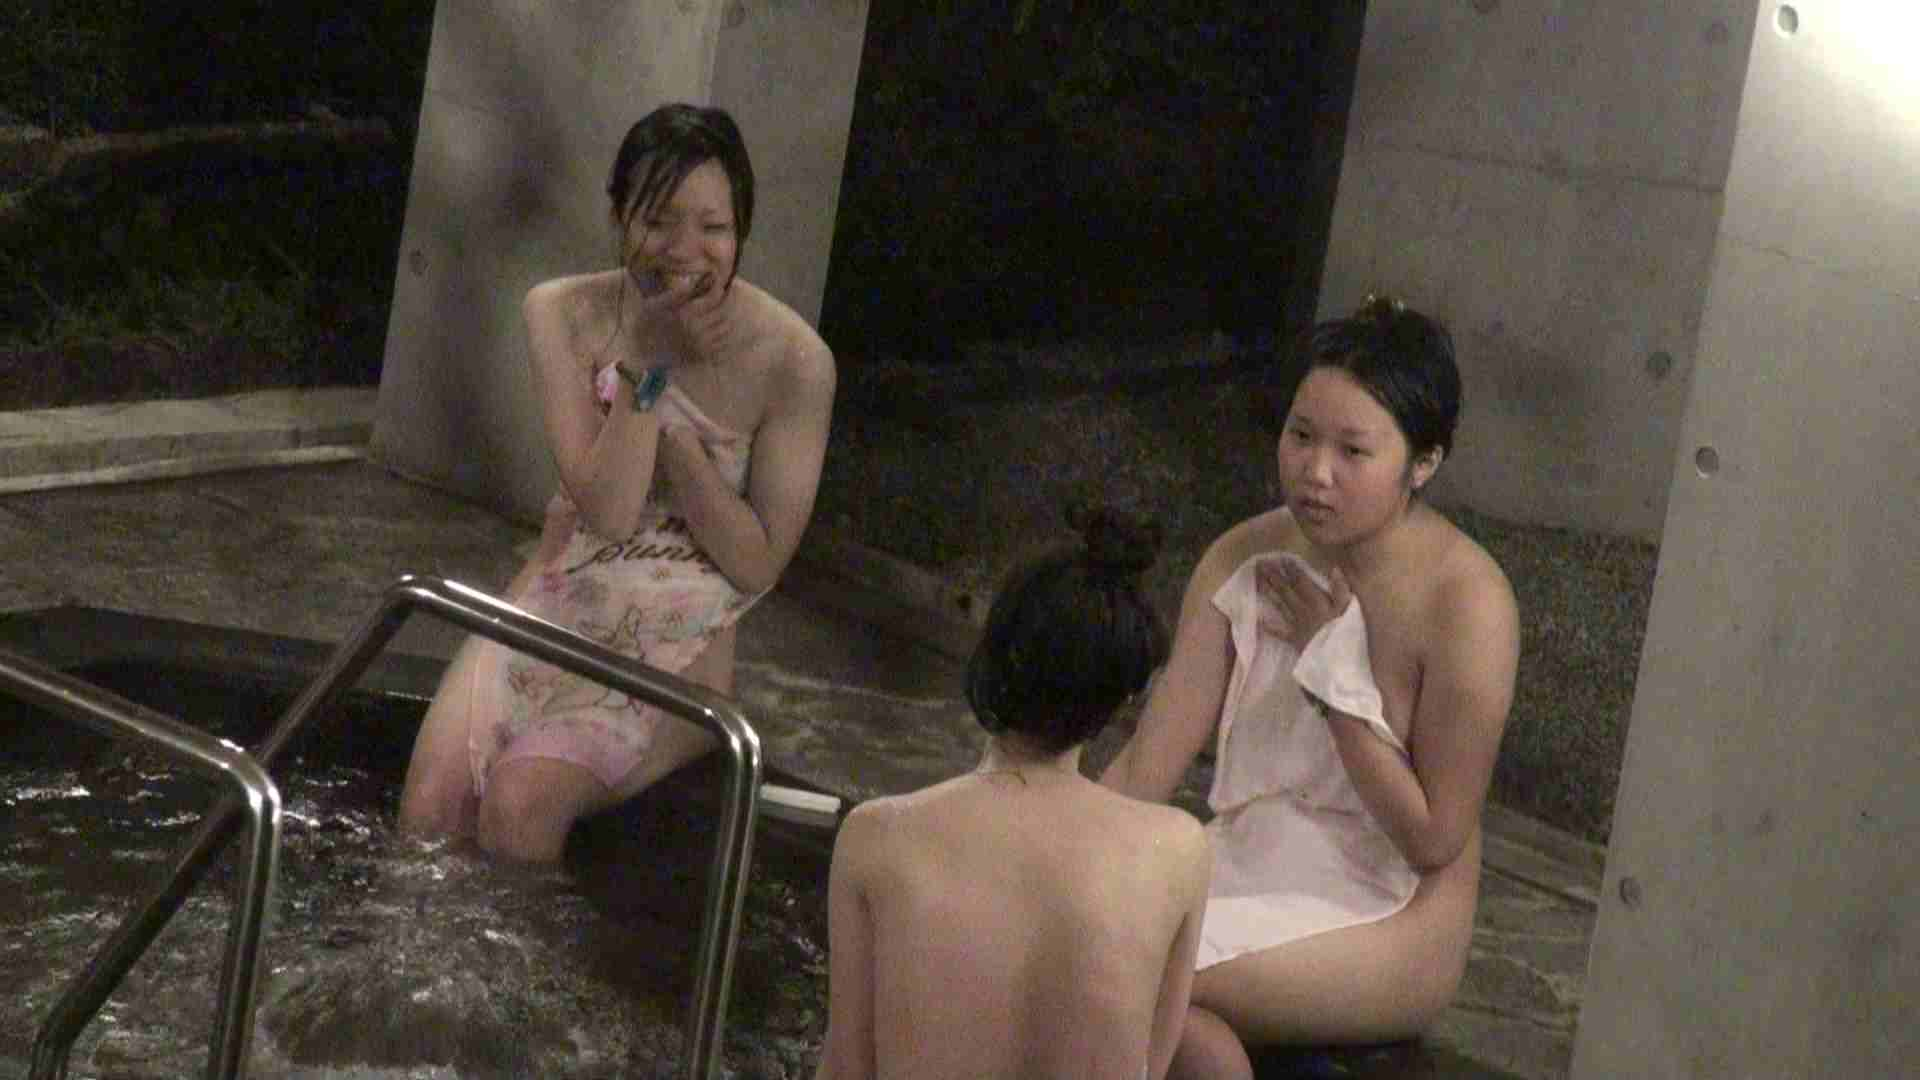 Aquaな露天風呂Vol.383 OLセックス 覗き性交動画流出 103画像 74